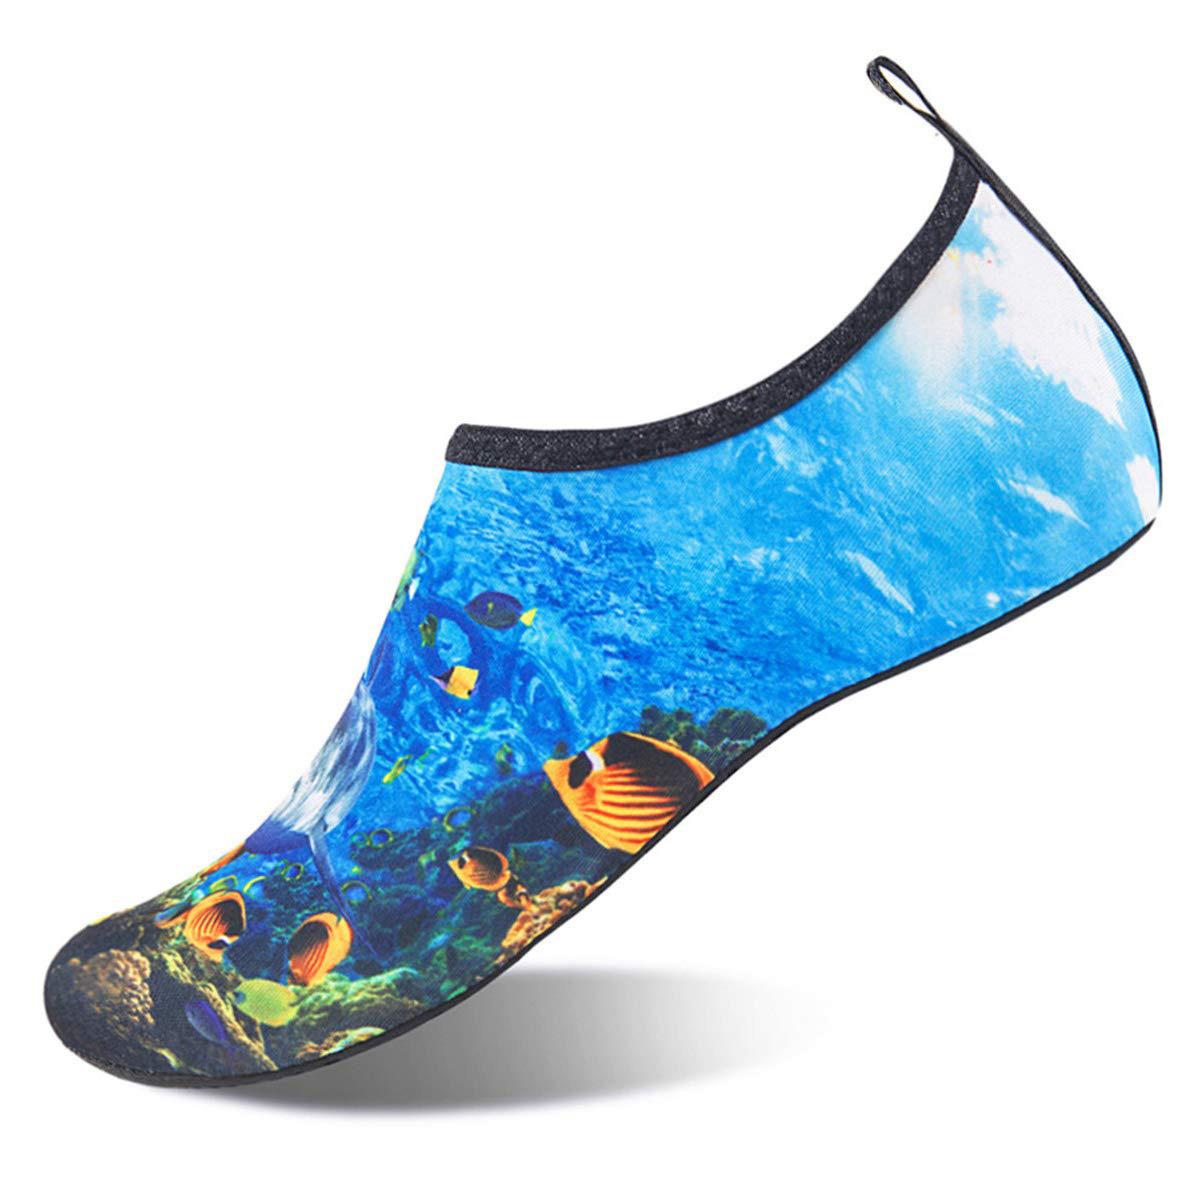 Water Sports Shoes Quick-Dry Aqua Slip-on for Men Women Kids